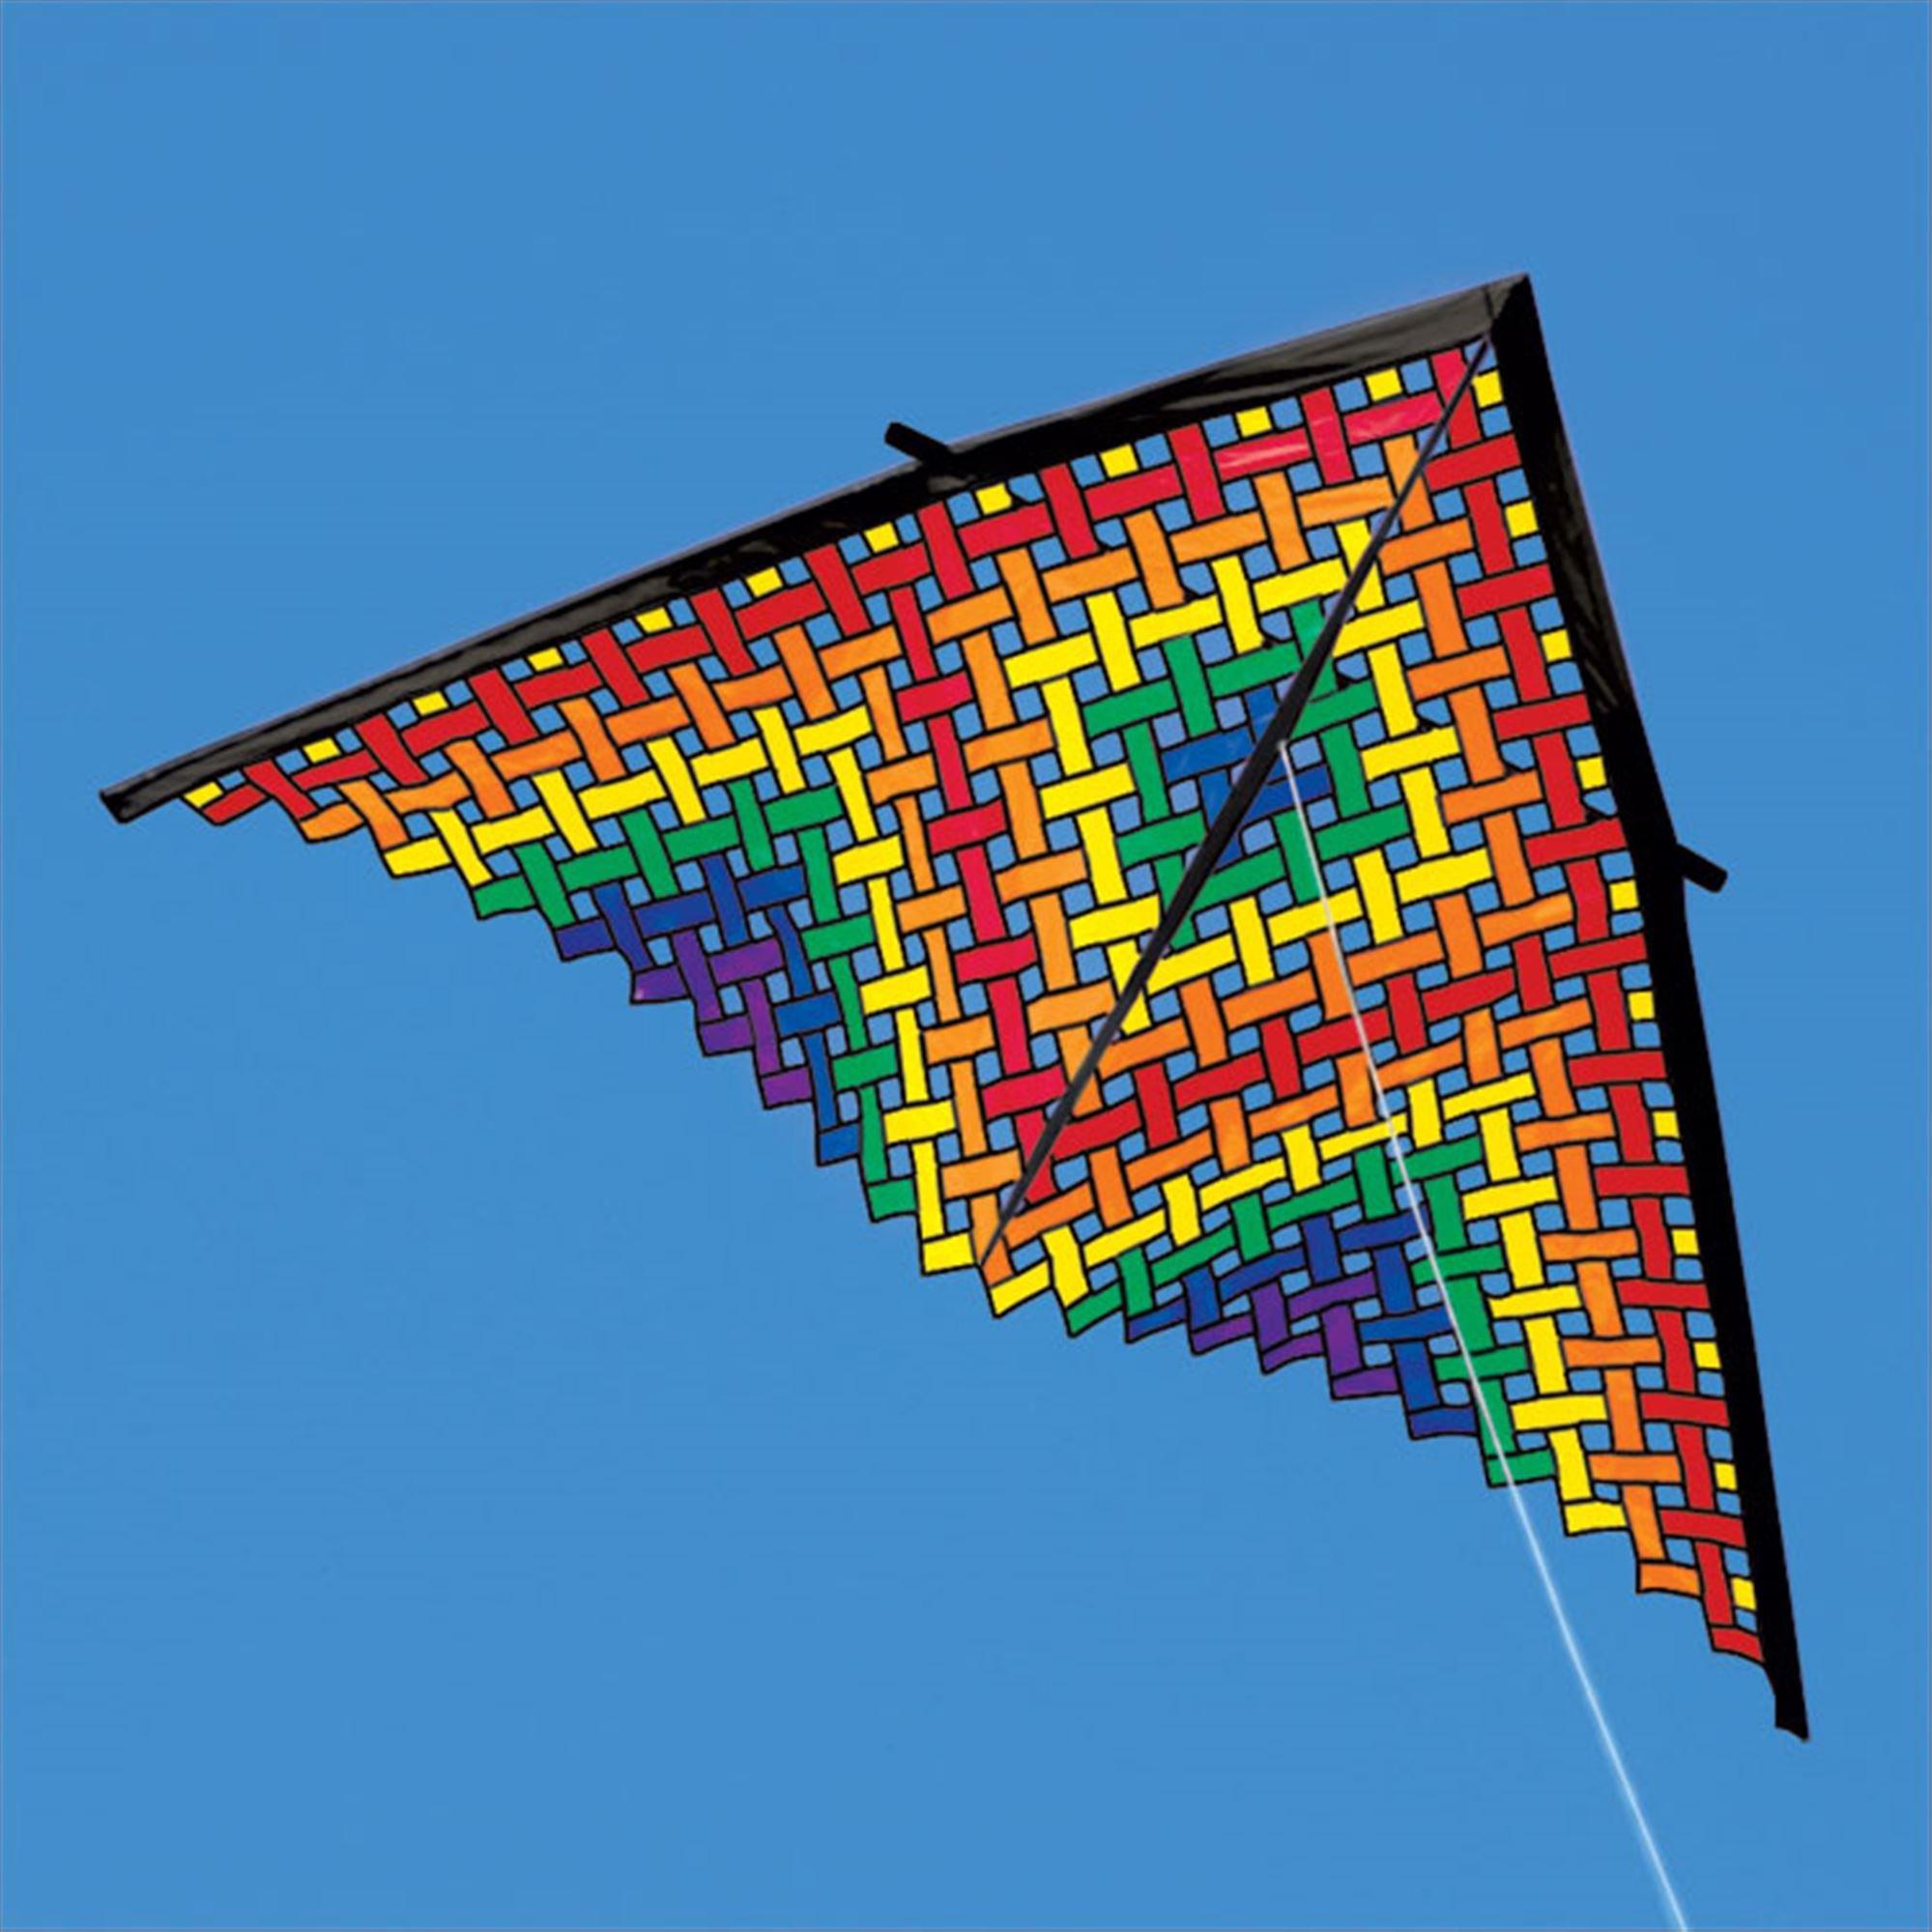 11ft Rainbow Mesh Delta Kite by Premier Kites (Image #1)